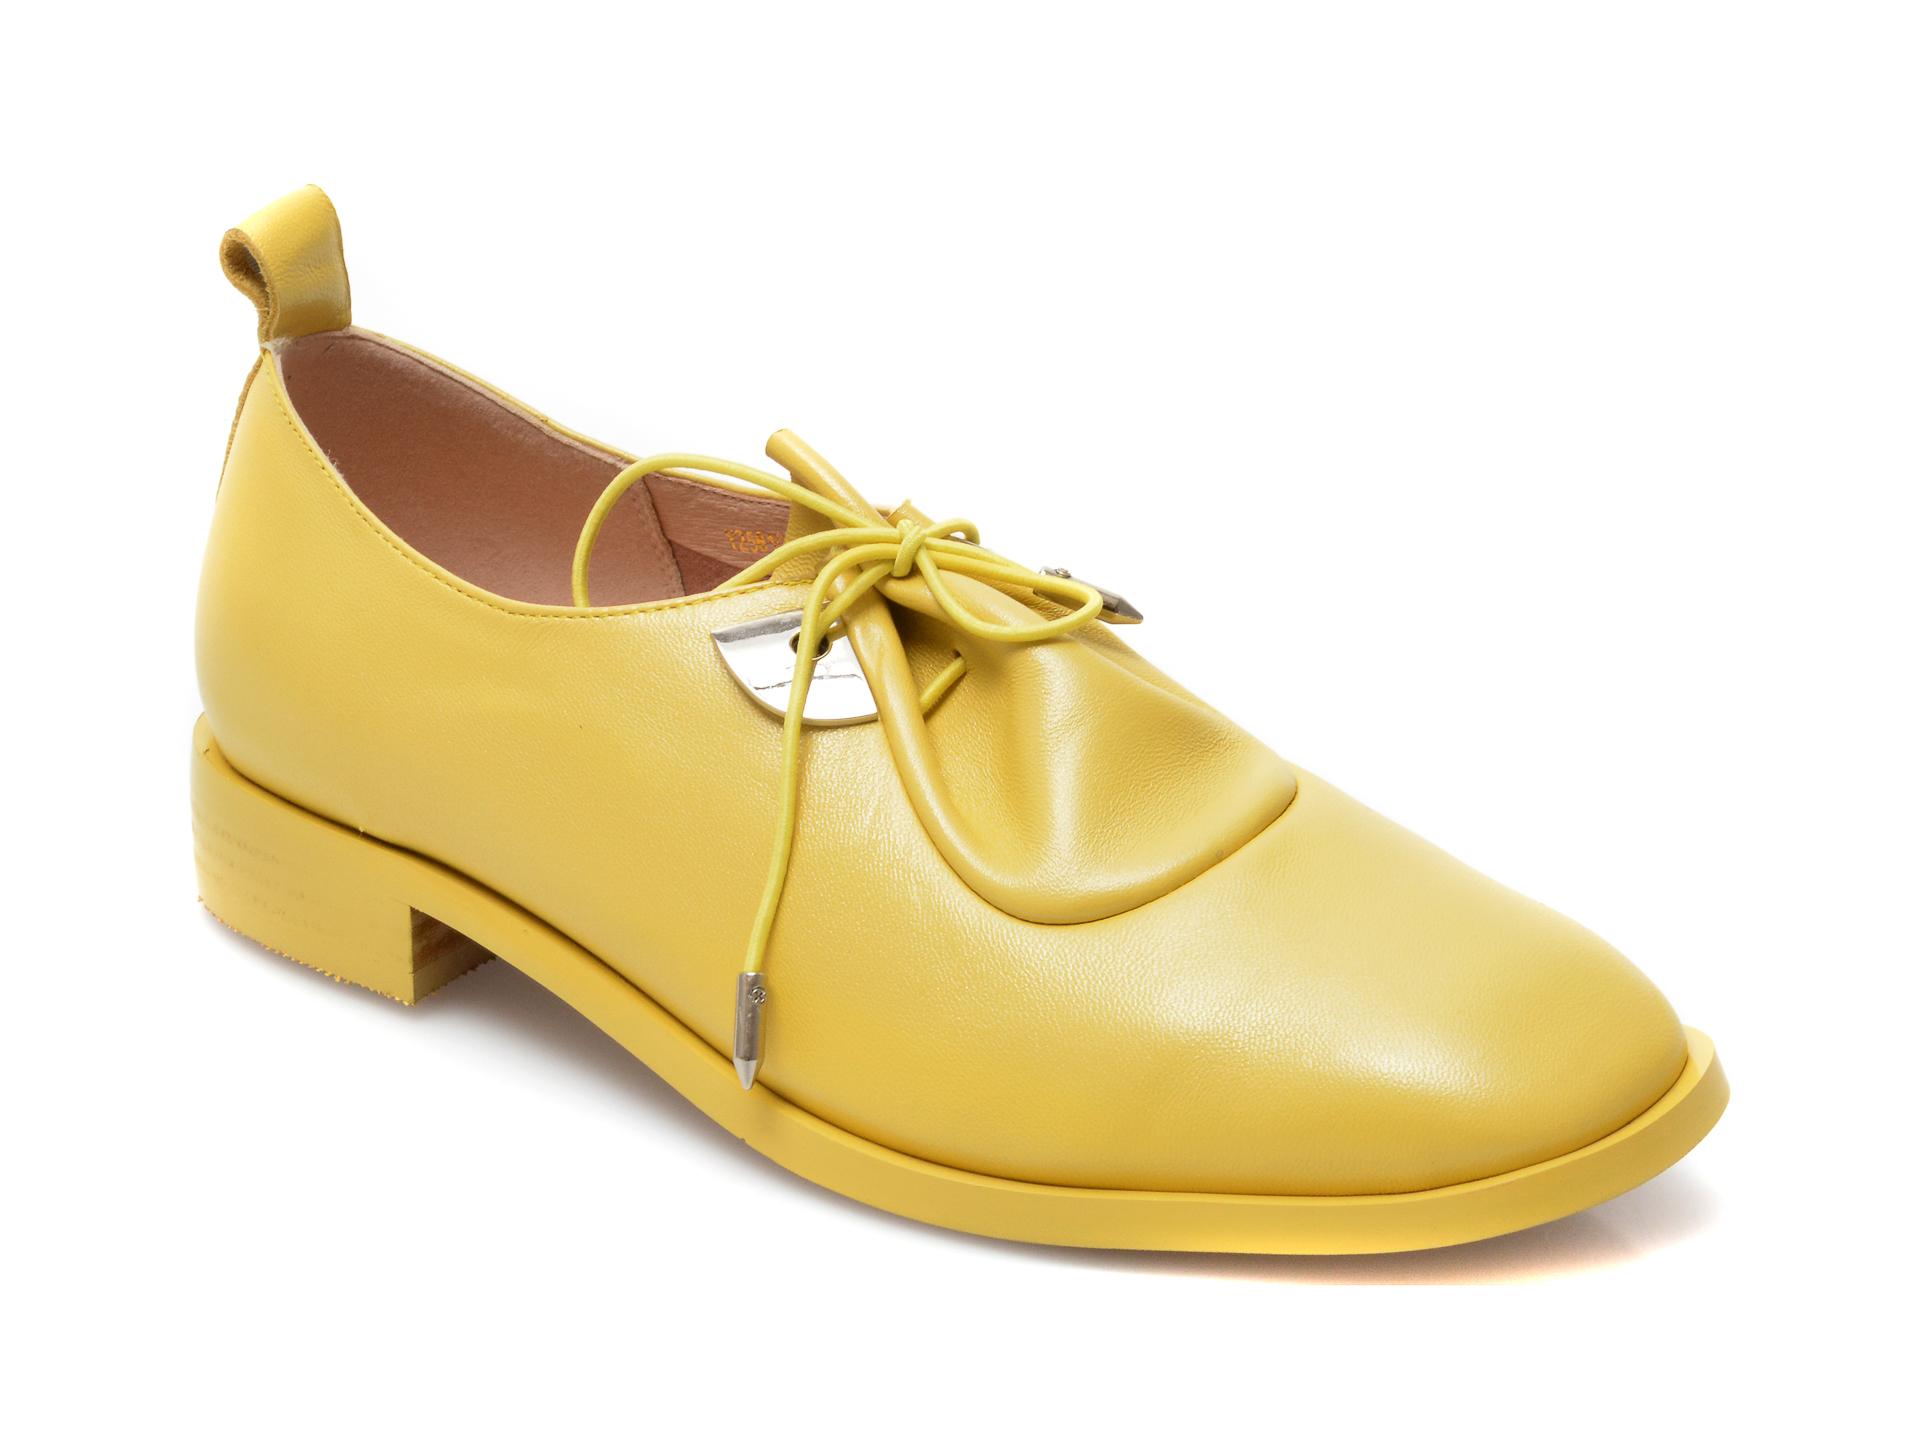 Pantofi EPICA galbeni, Y2561Q1, din piele naturala imagine otter.ro 2021